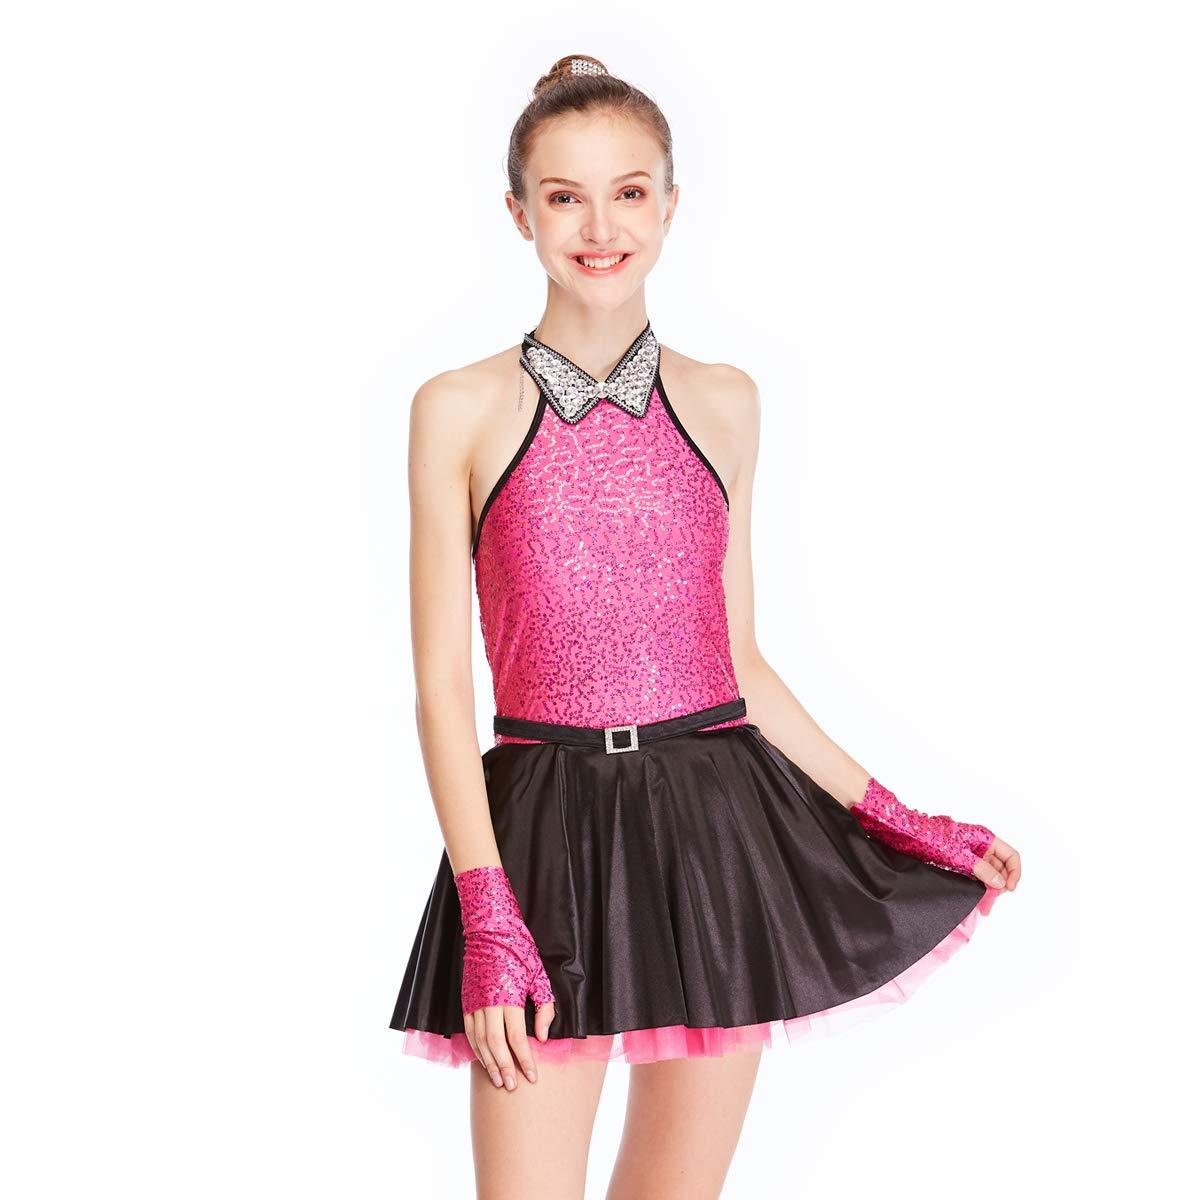 MiDee Jazz Dress Dance Costume High Neck with Sparkle Austria Rhinestones Collar (LA, HotPink) by MiDee